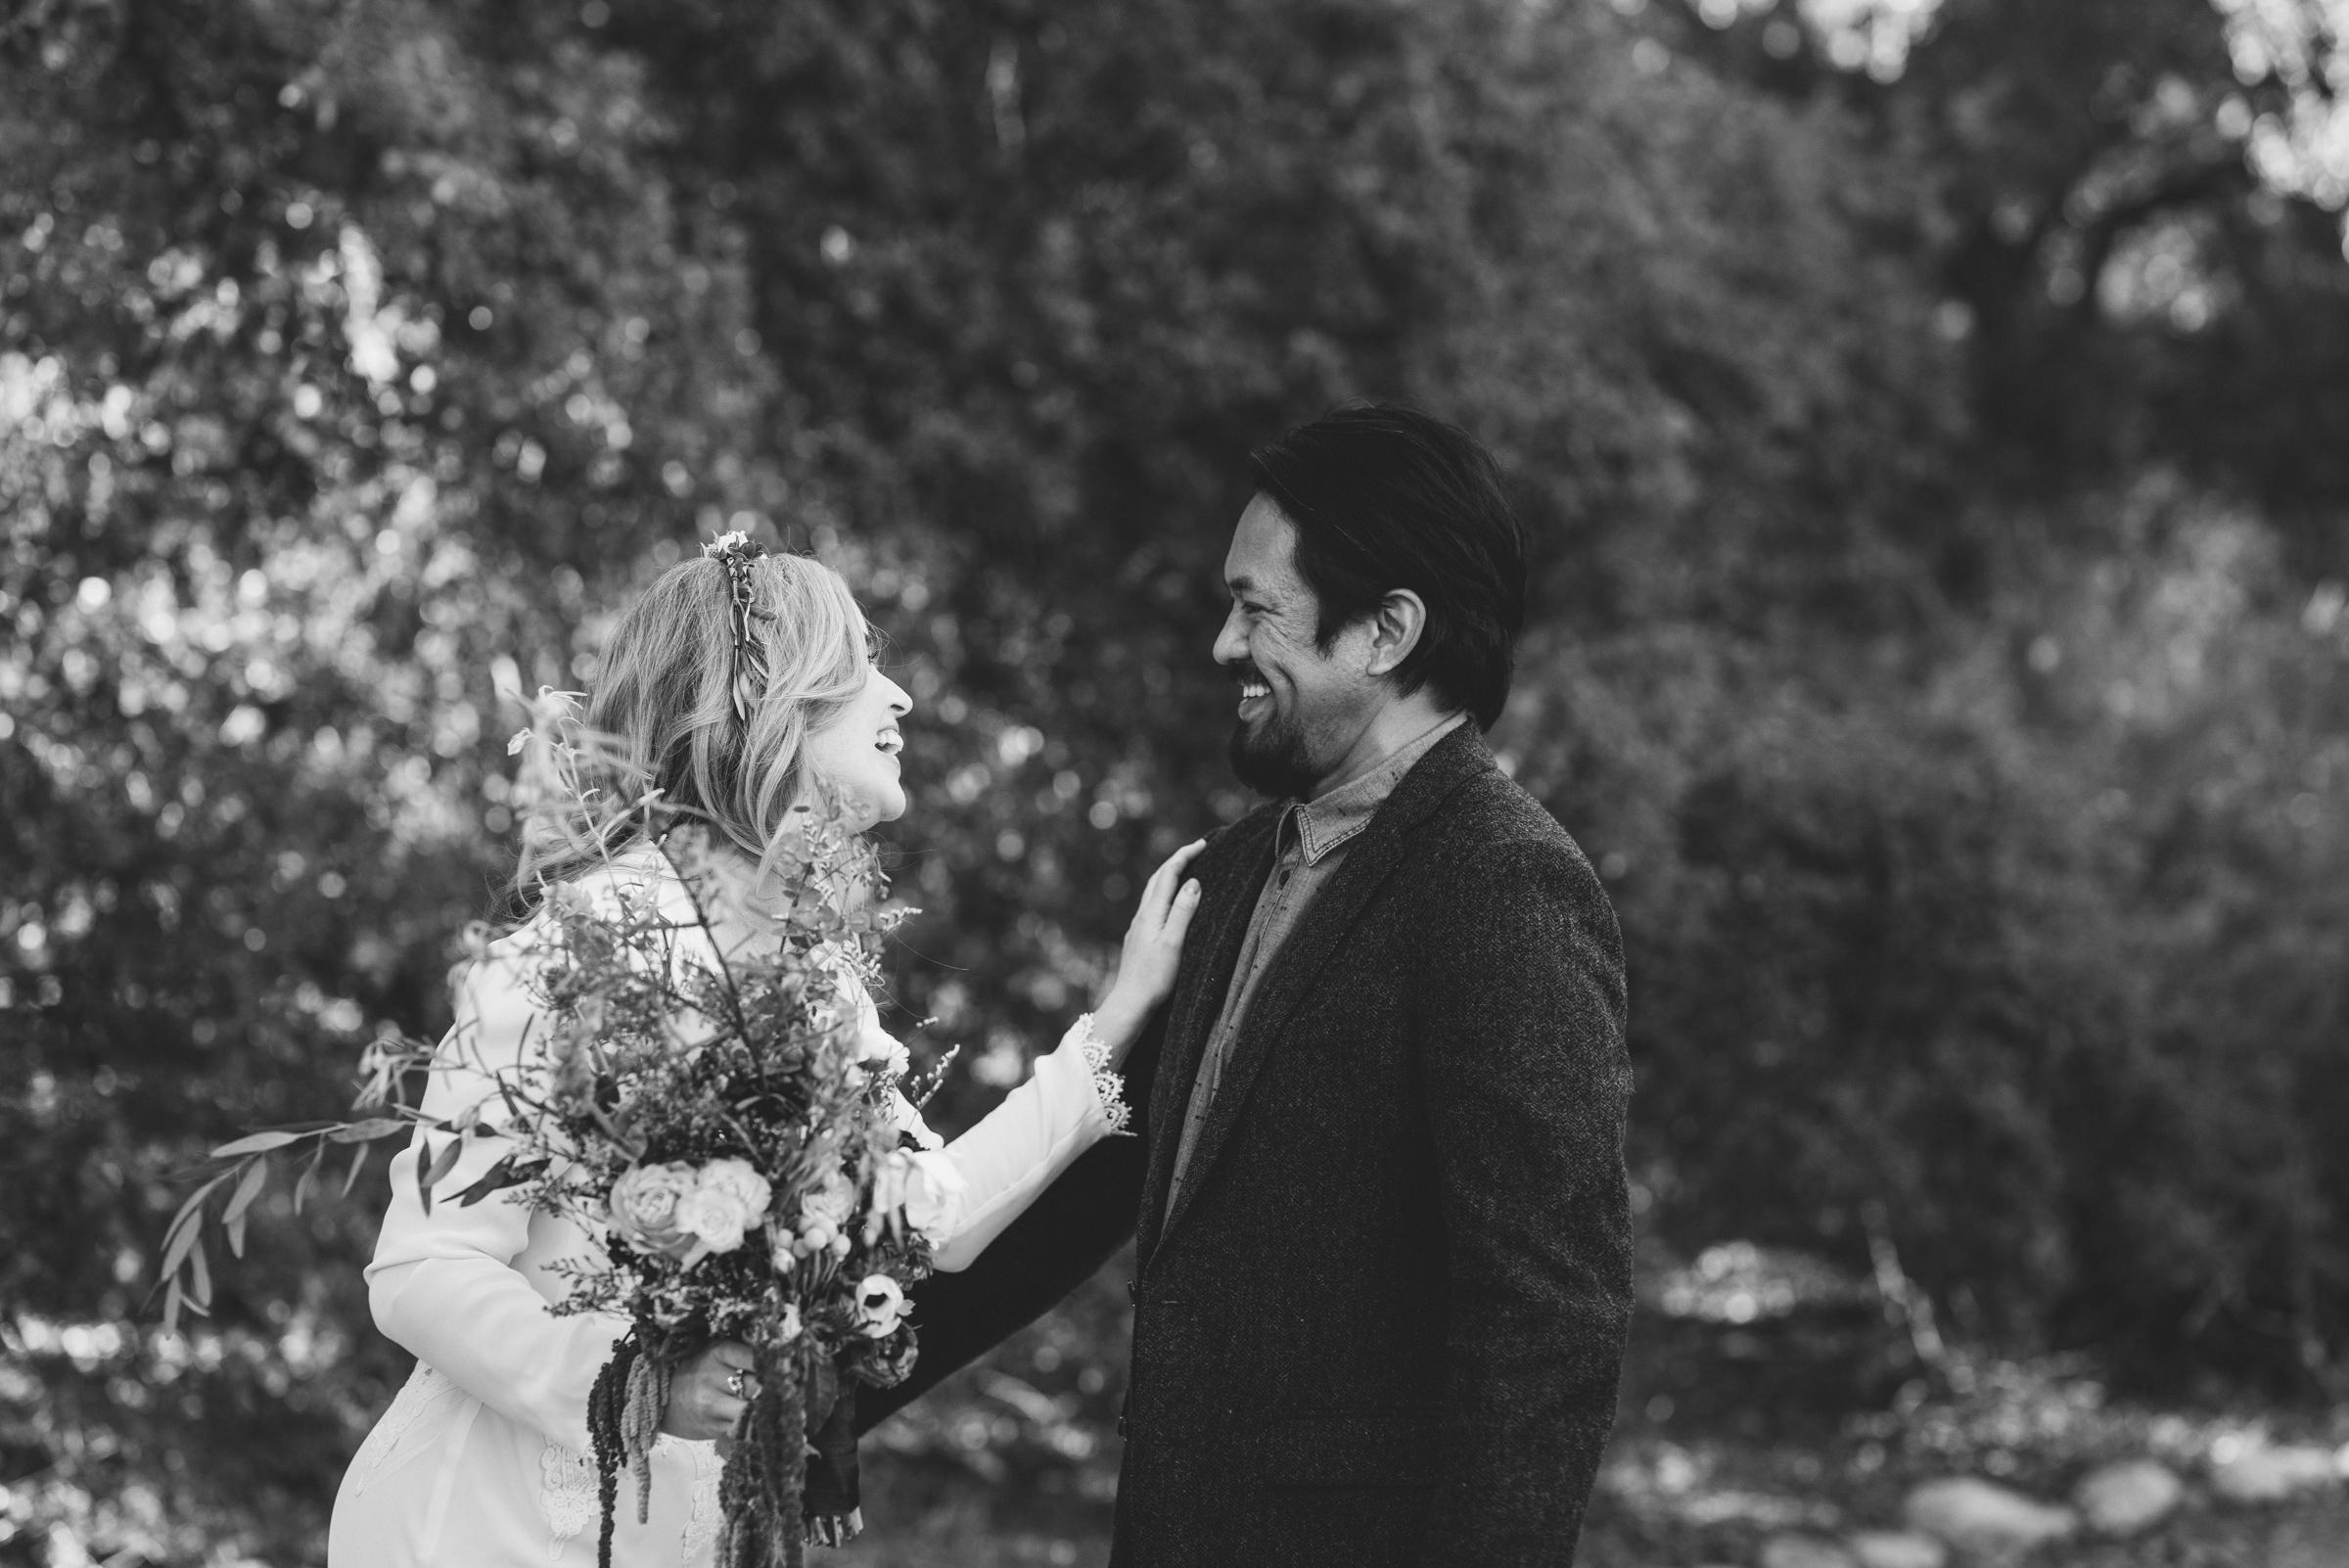 ©Isaiah + Taylor Photography - Intimate Elopement, Eaton Canyon, Los Angeles Wedding Photographer-10.jpg